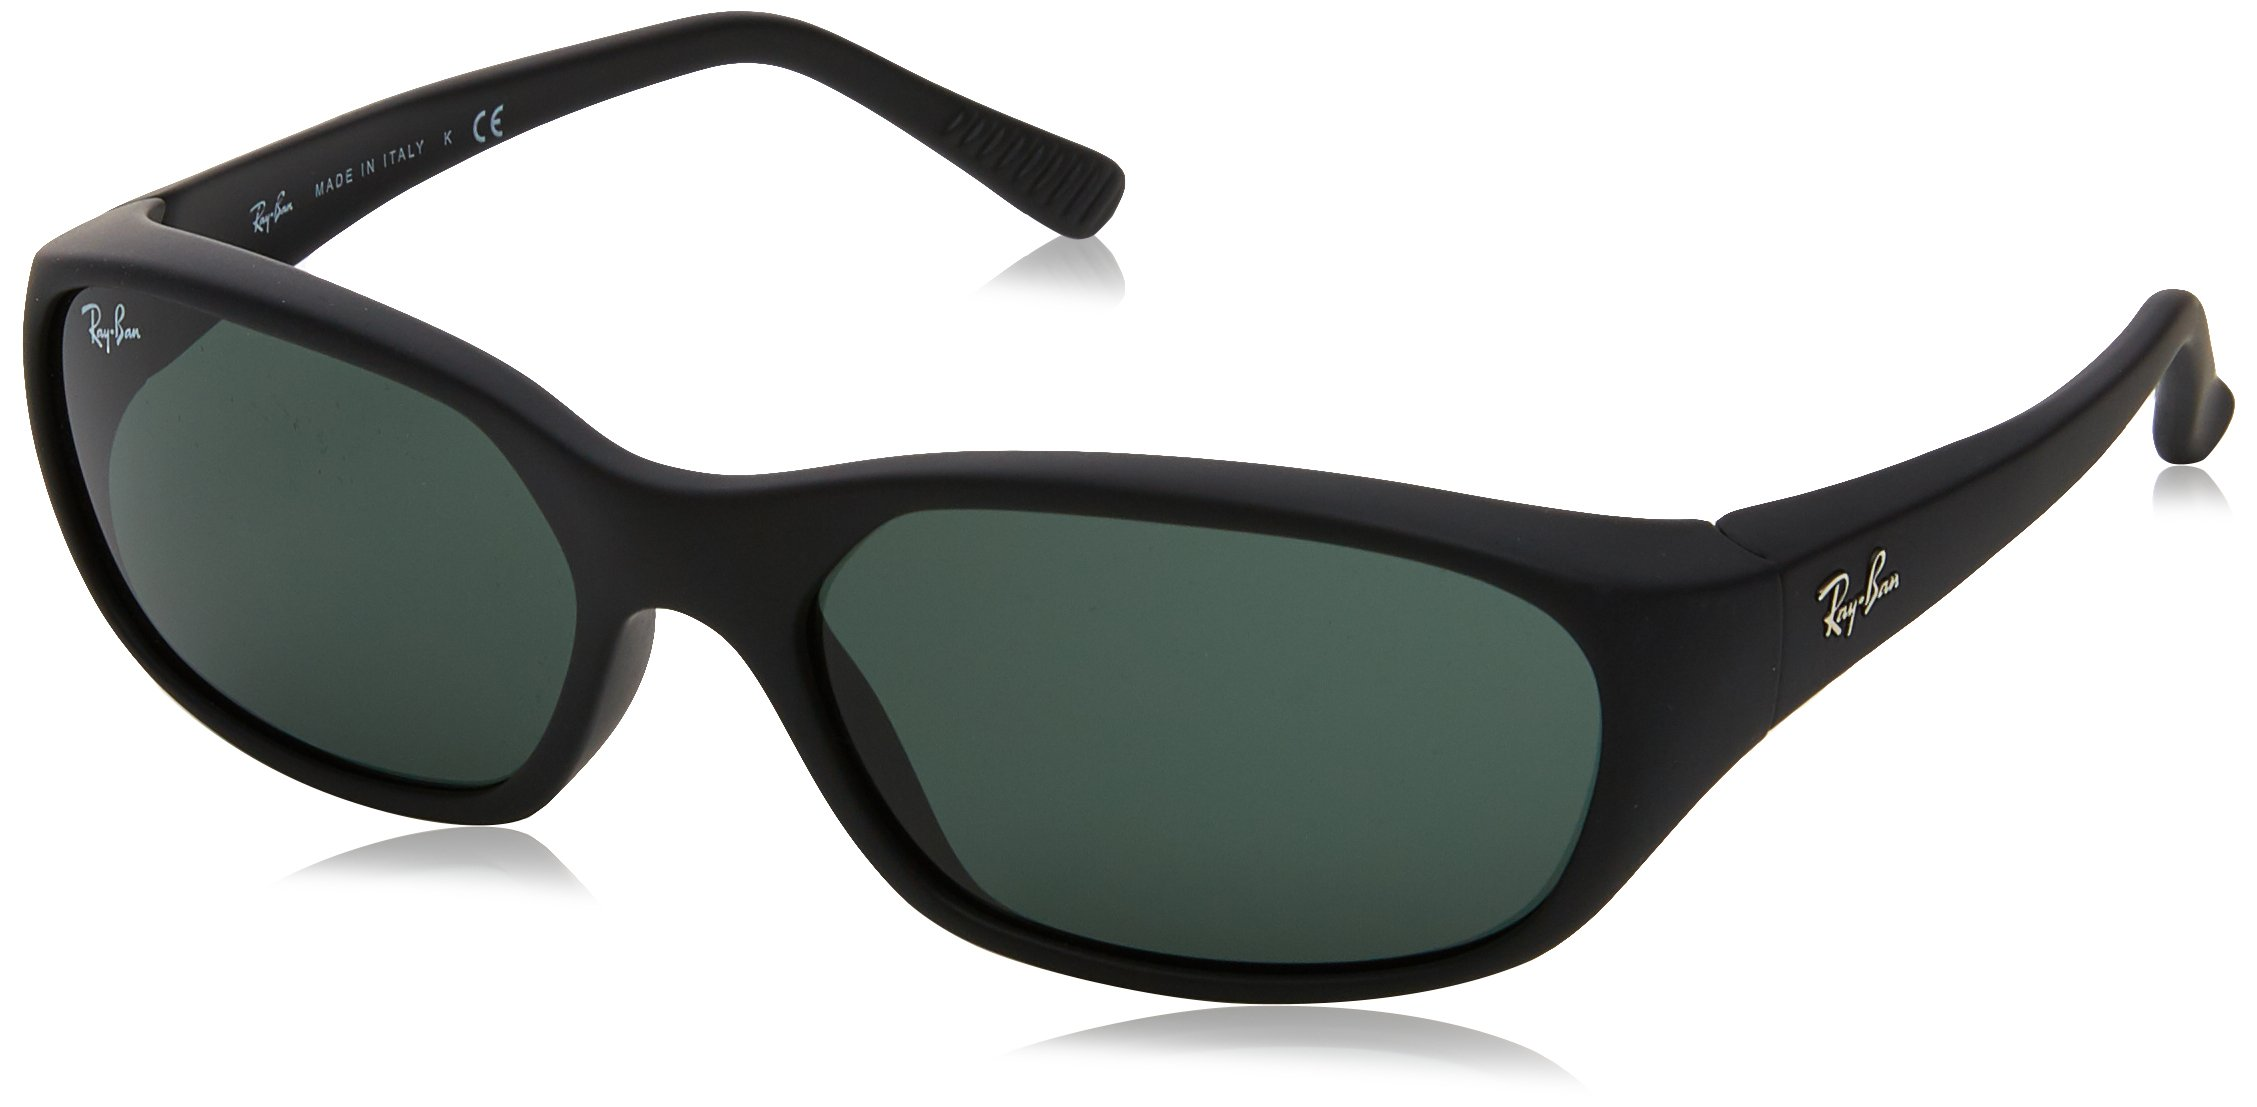 Ray-Ban Men's Daddy-o Rectangular Sunglasses, Matte Black, 59 mm